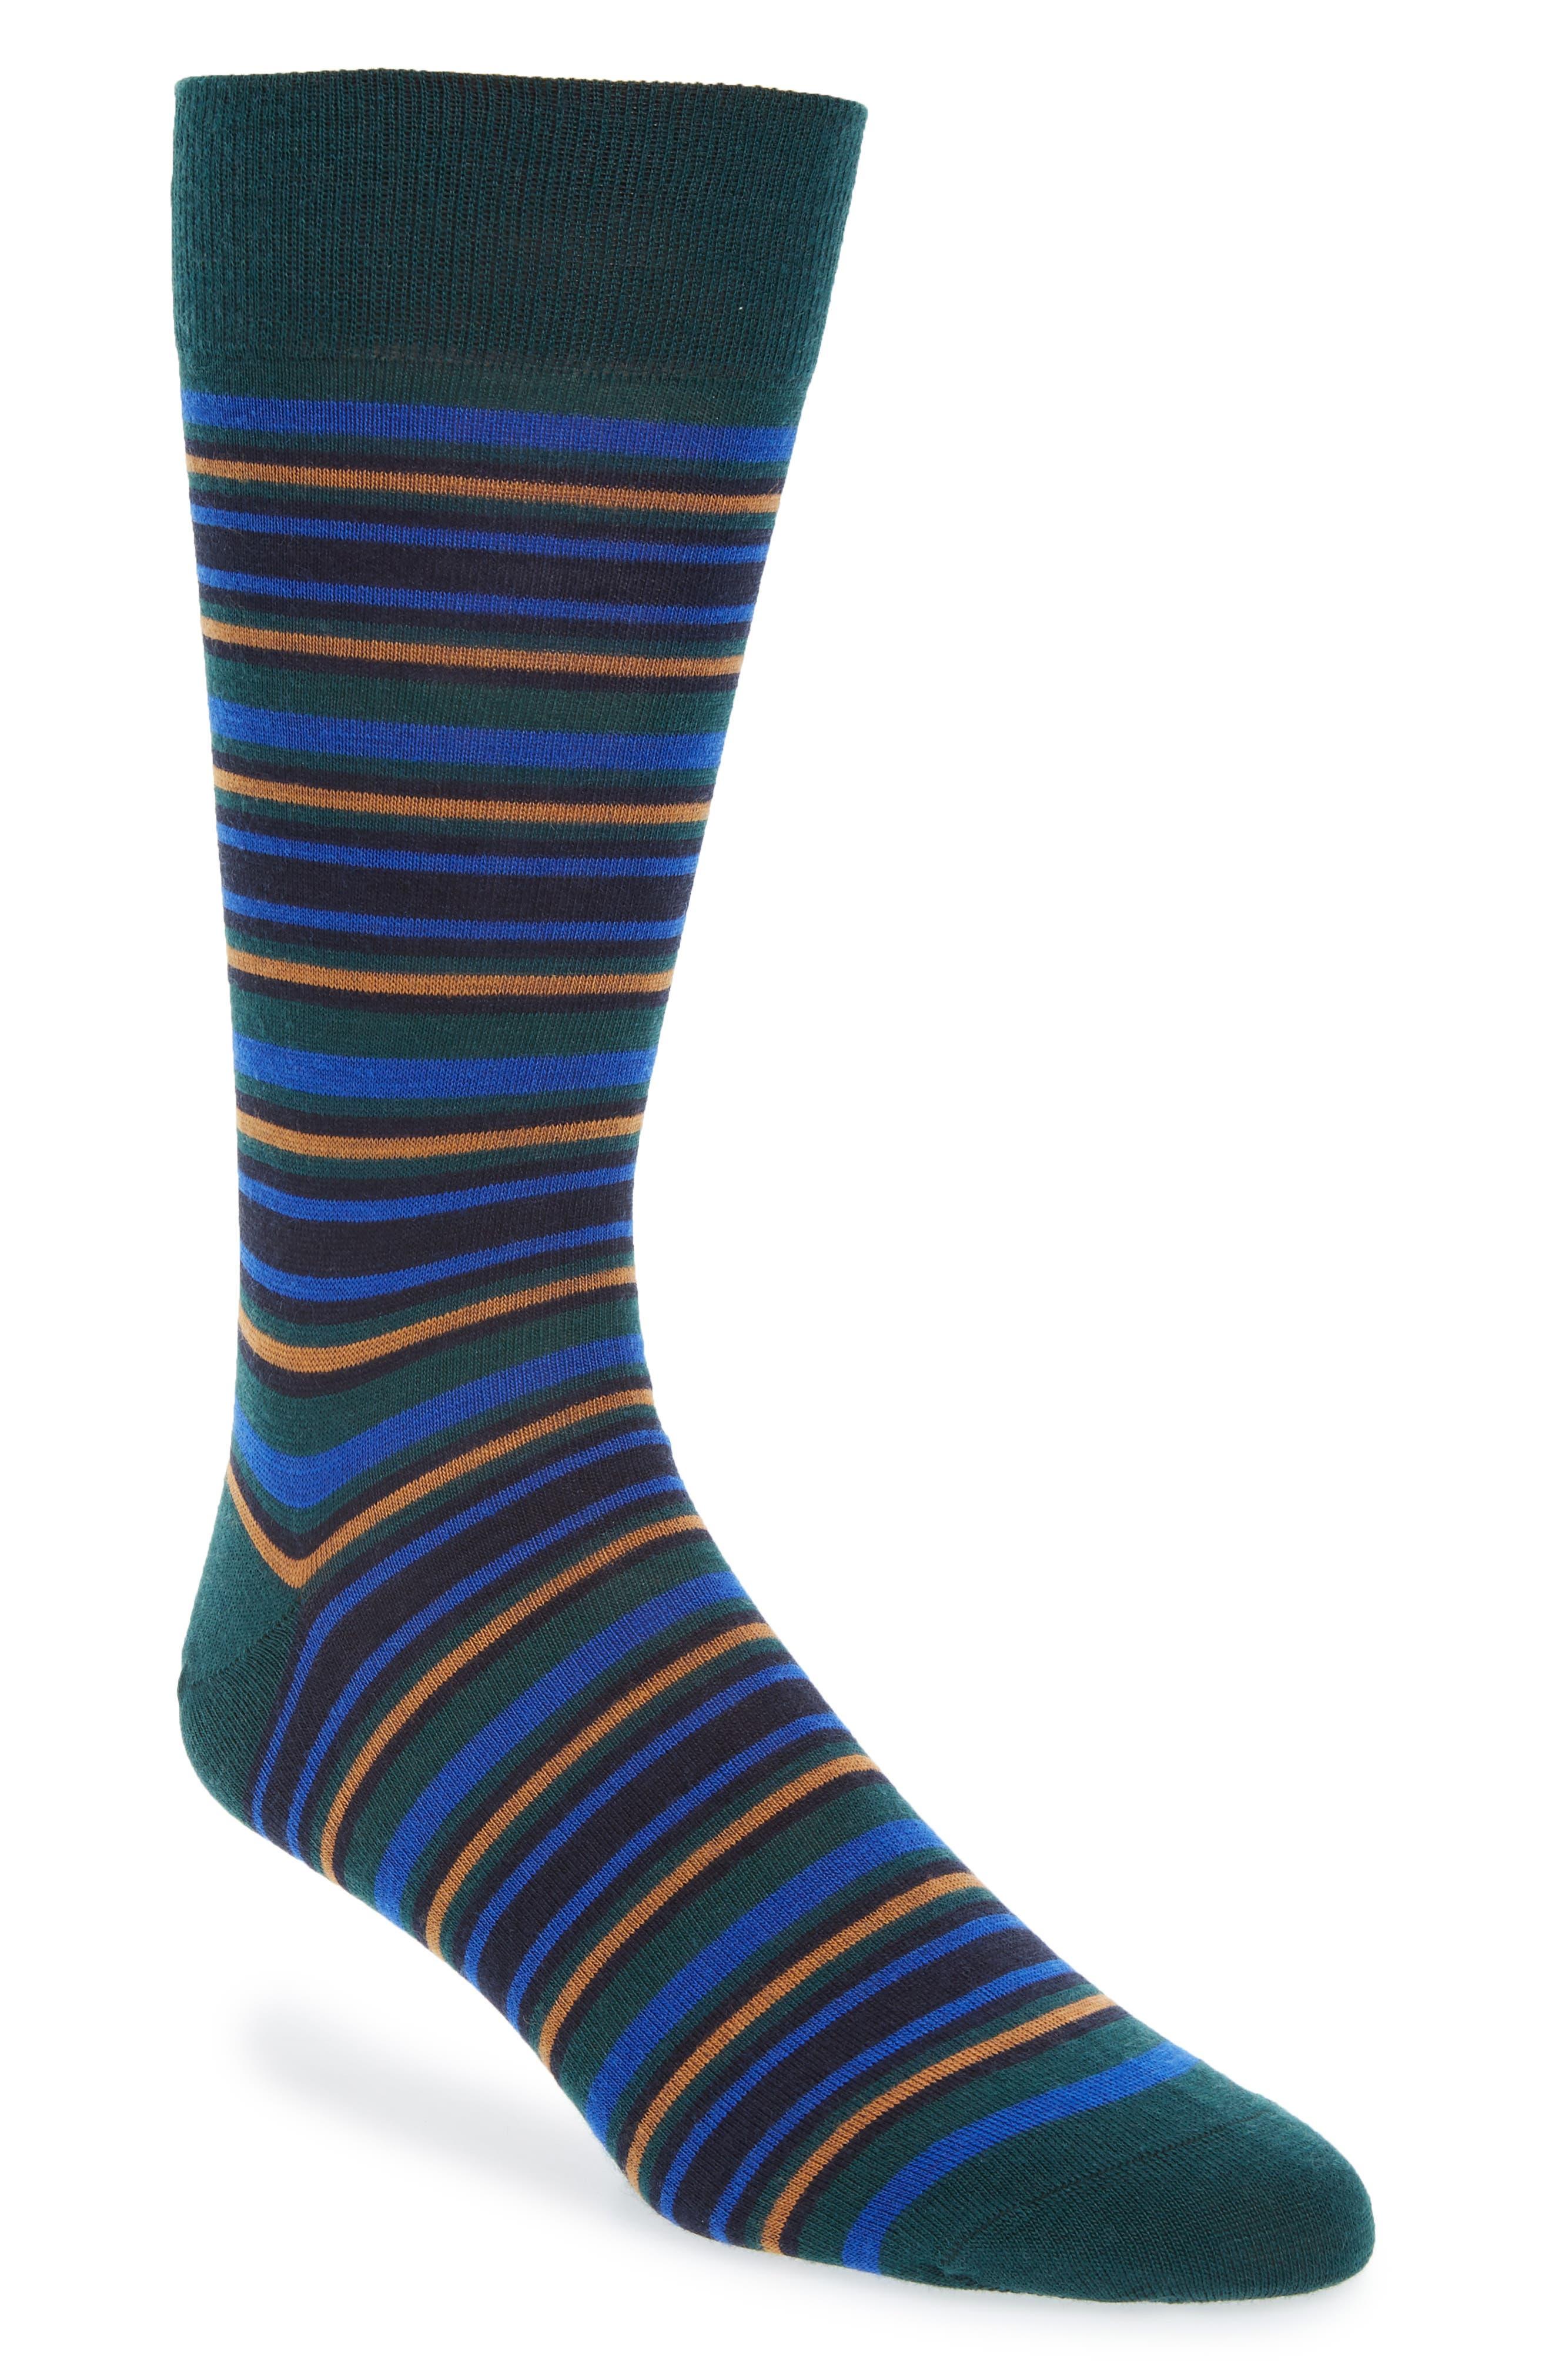 PANTHERELLA Men'S Piper Striped Wool Socks in Tartan